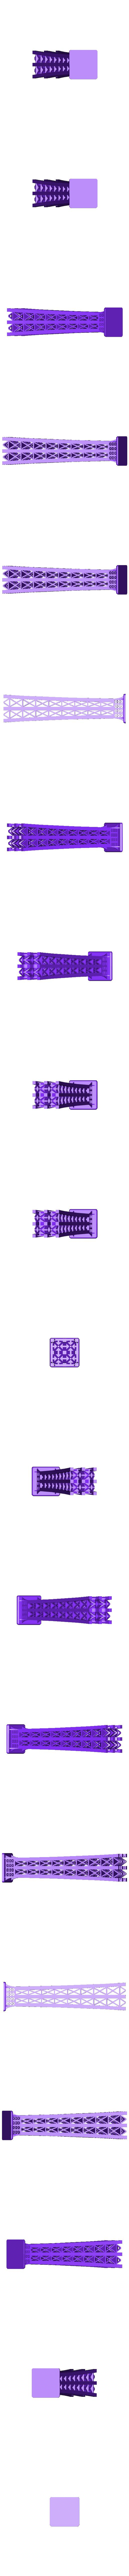 EiffelTower_part_B.stl Download free STL file Eiffel Tower tricolor • 3D printable object, jteix